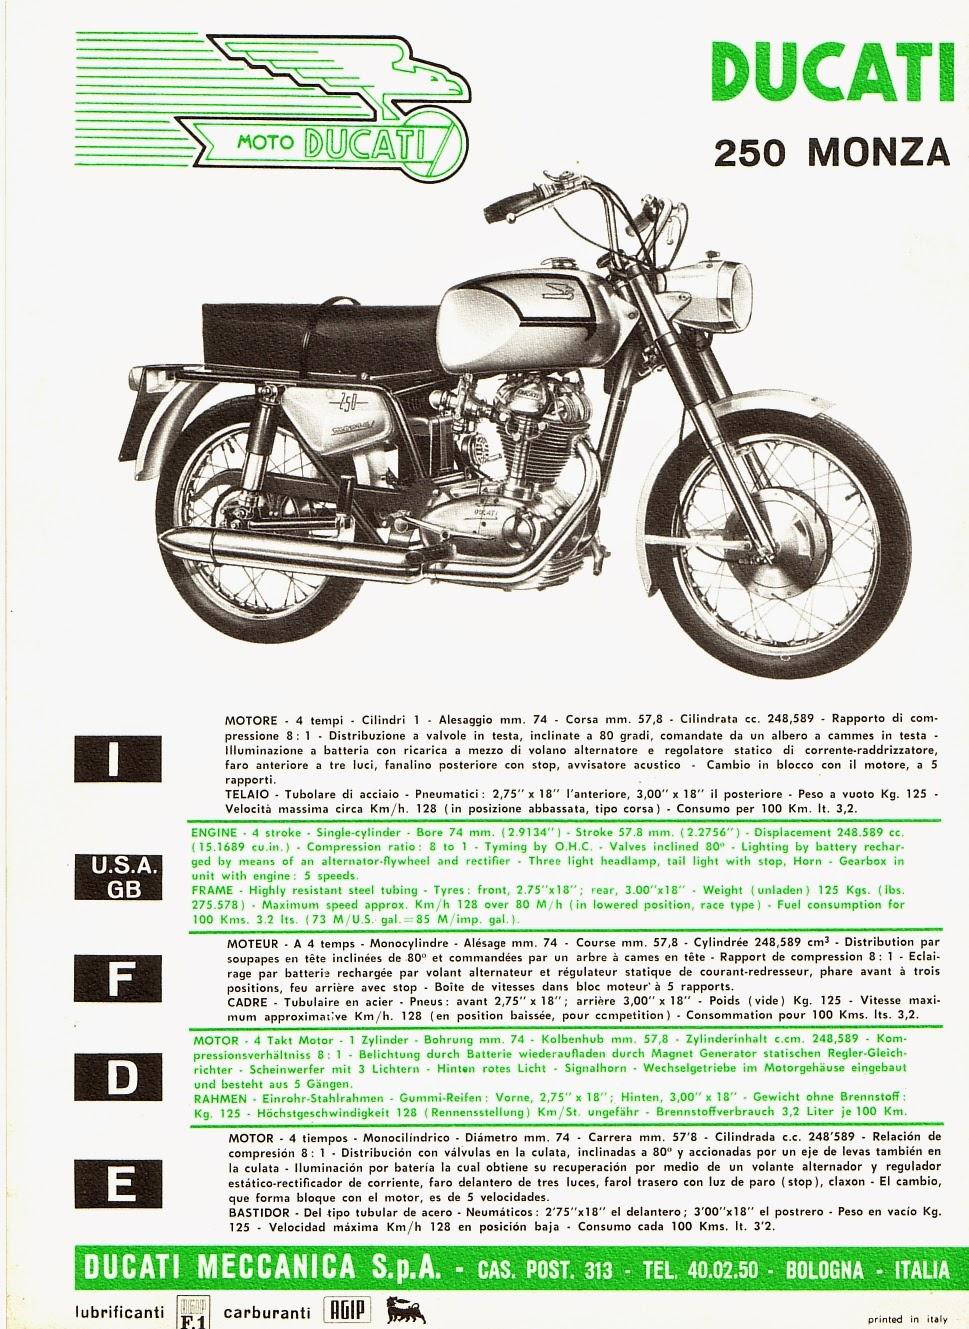 Ducati 250 Monza brochure